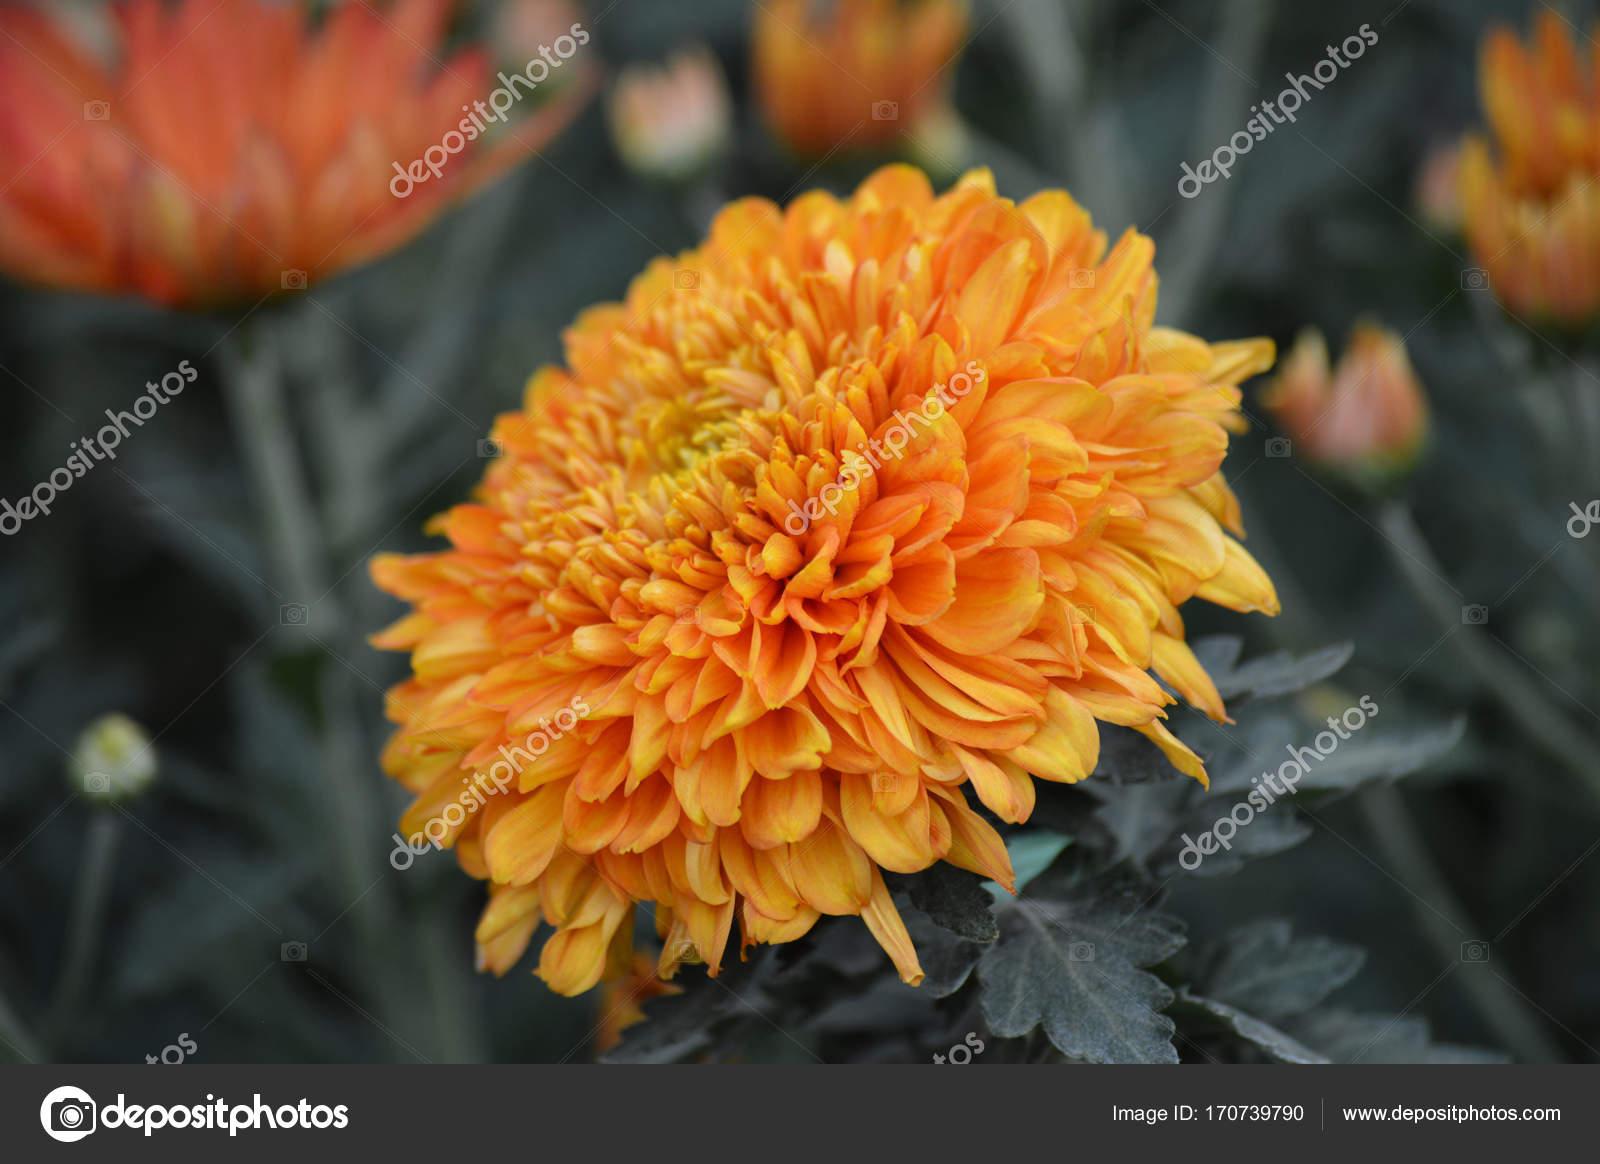 Mum Flower In The Garden Stock Photo C Trek13 170739790